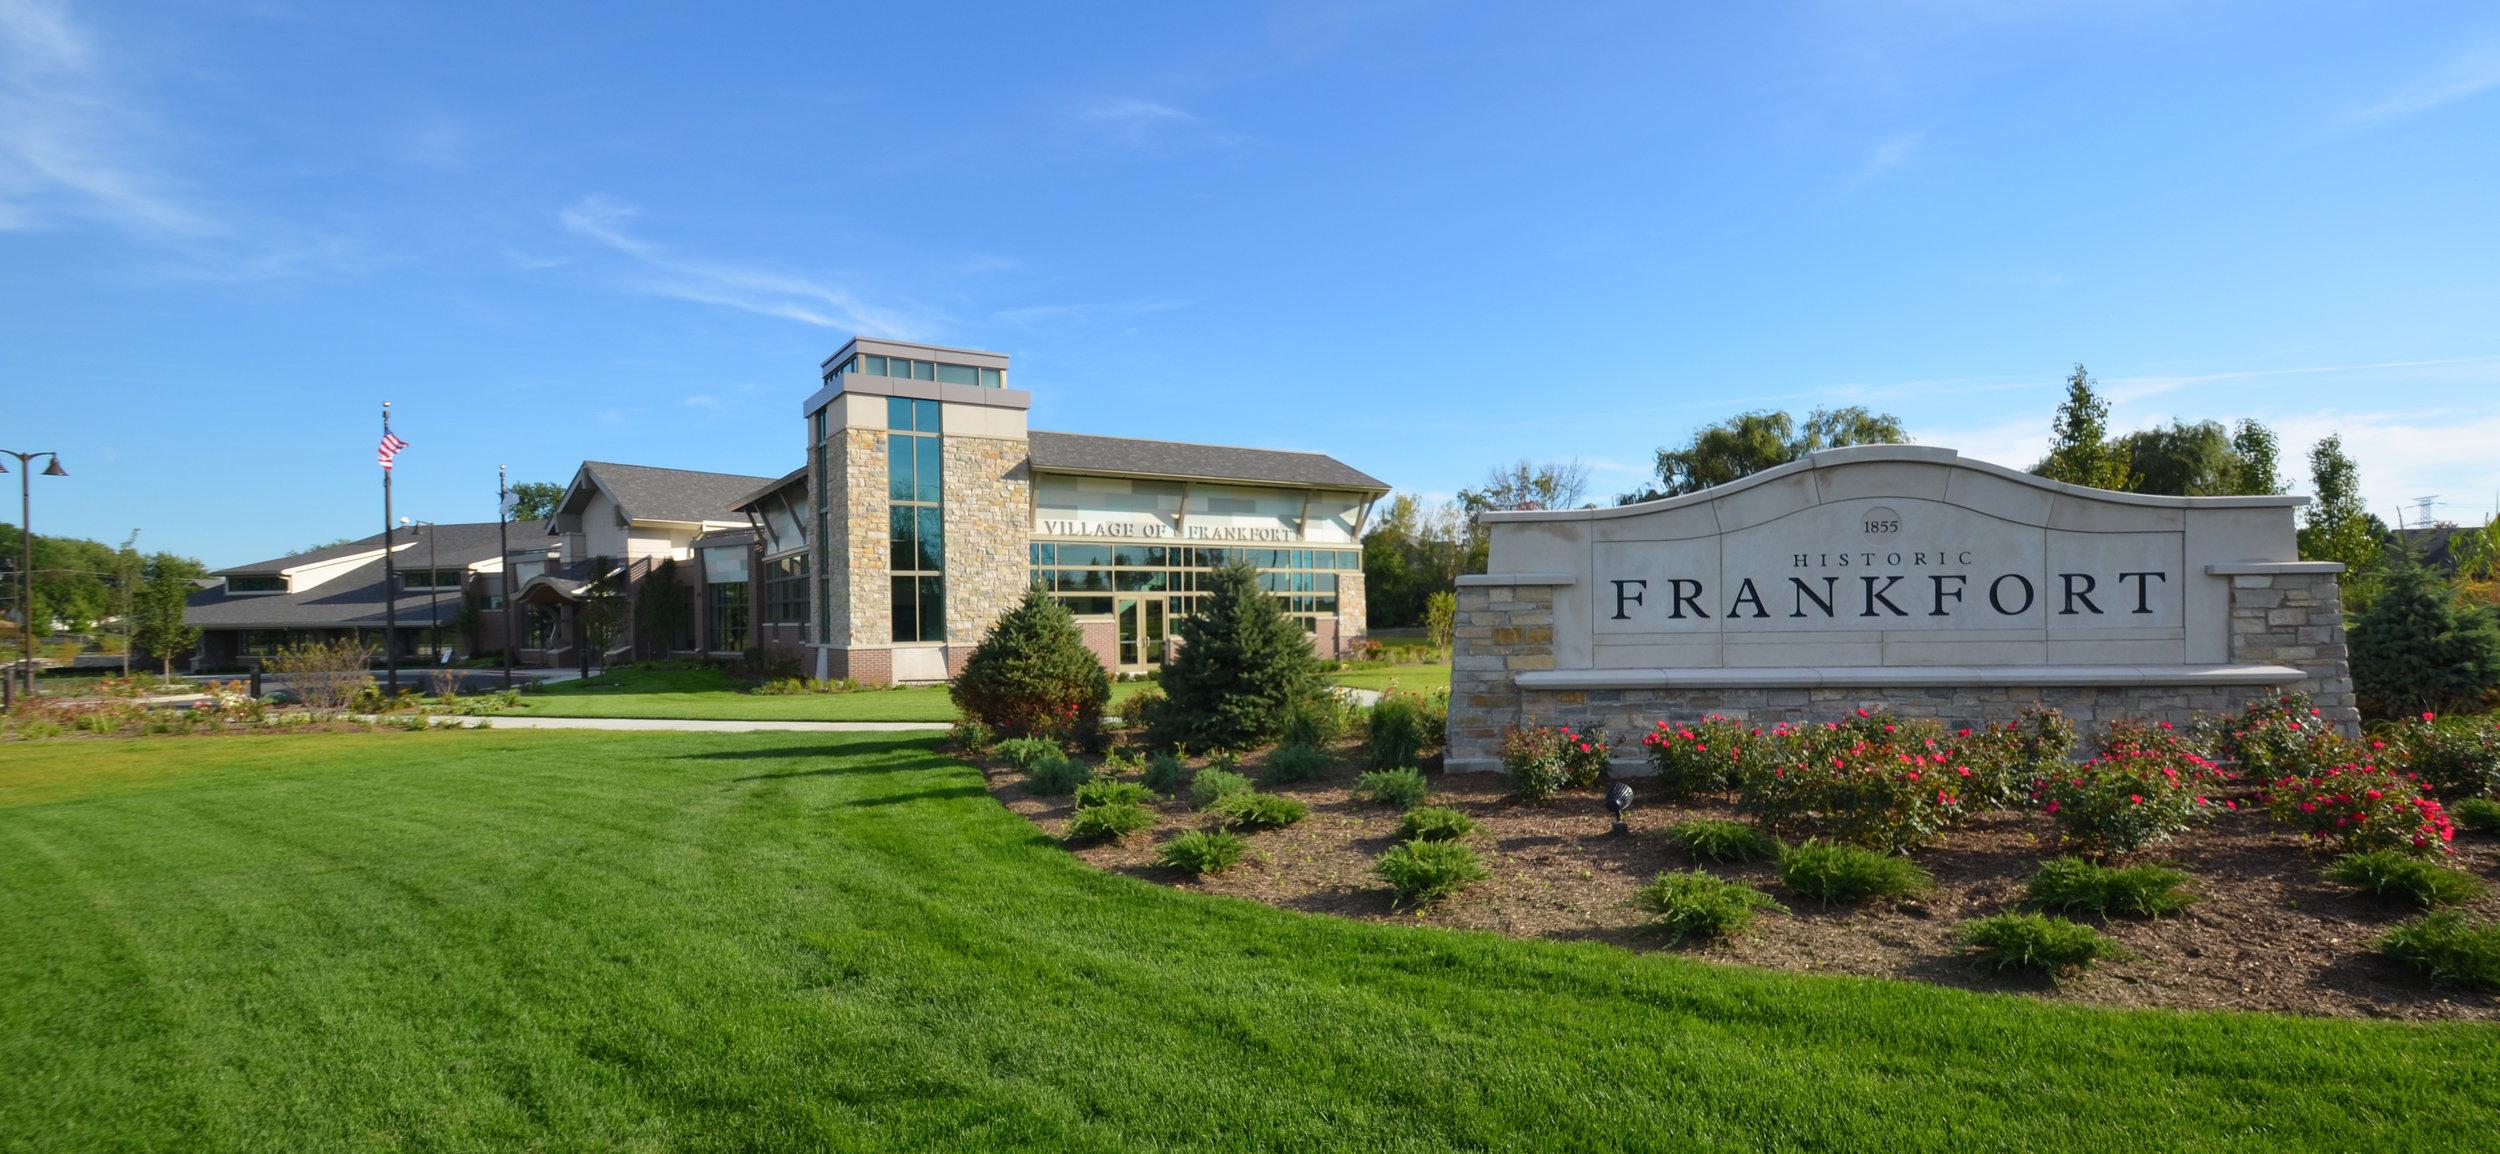 FRANKFORT VILLAGE HALL    Frankfort, IL